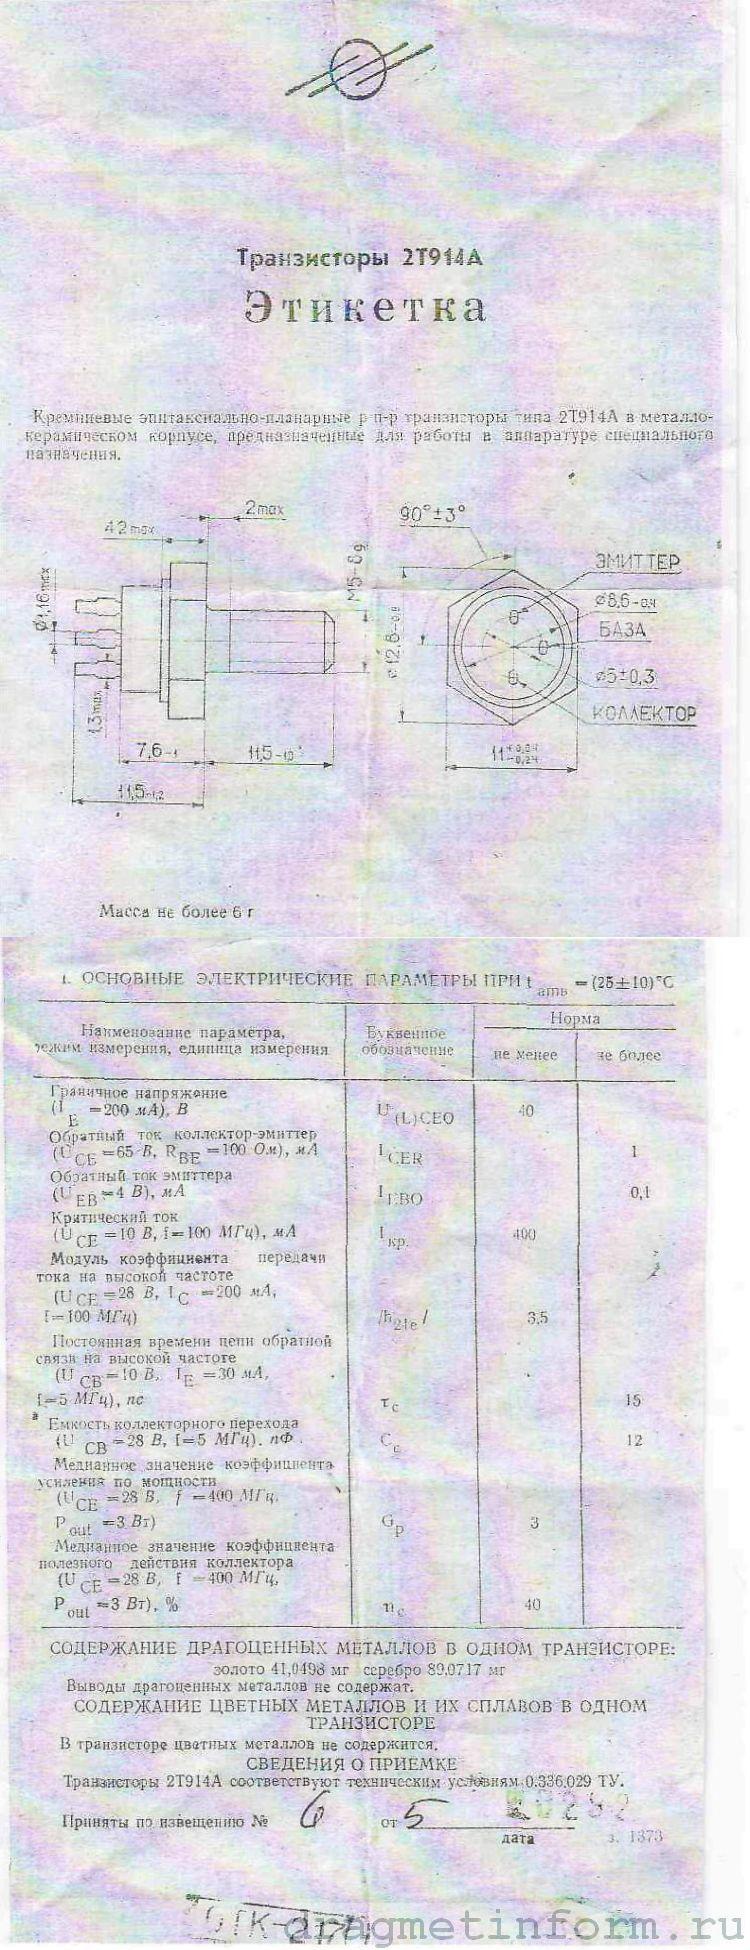 Формуляр 2Т9114А